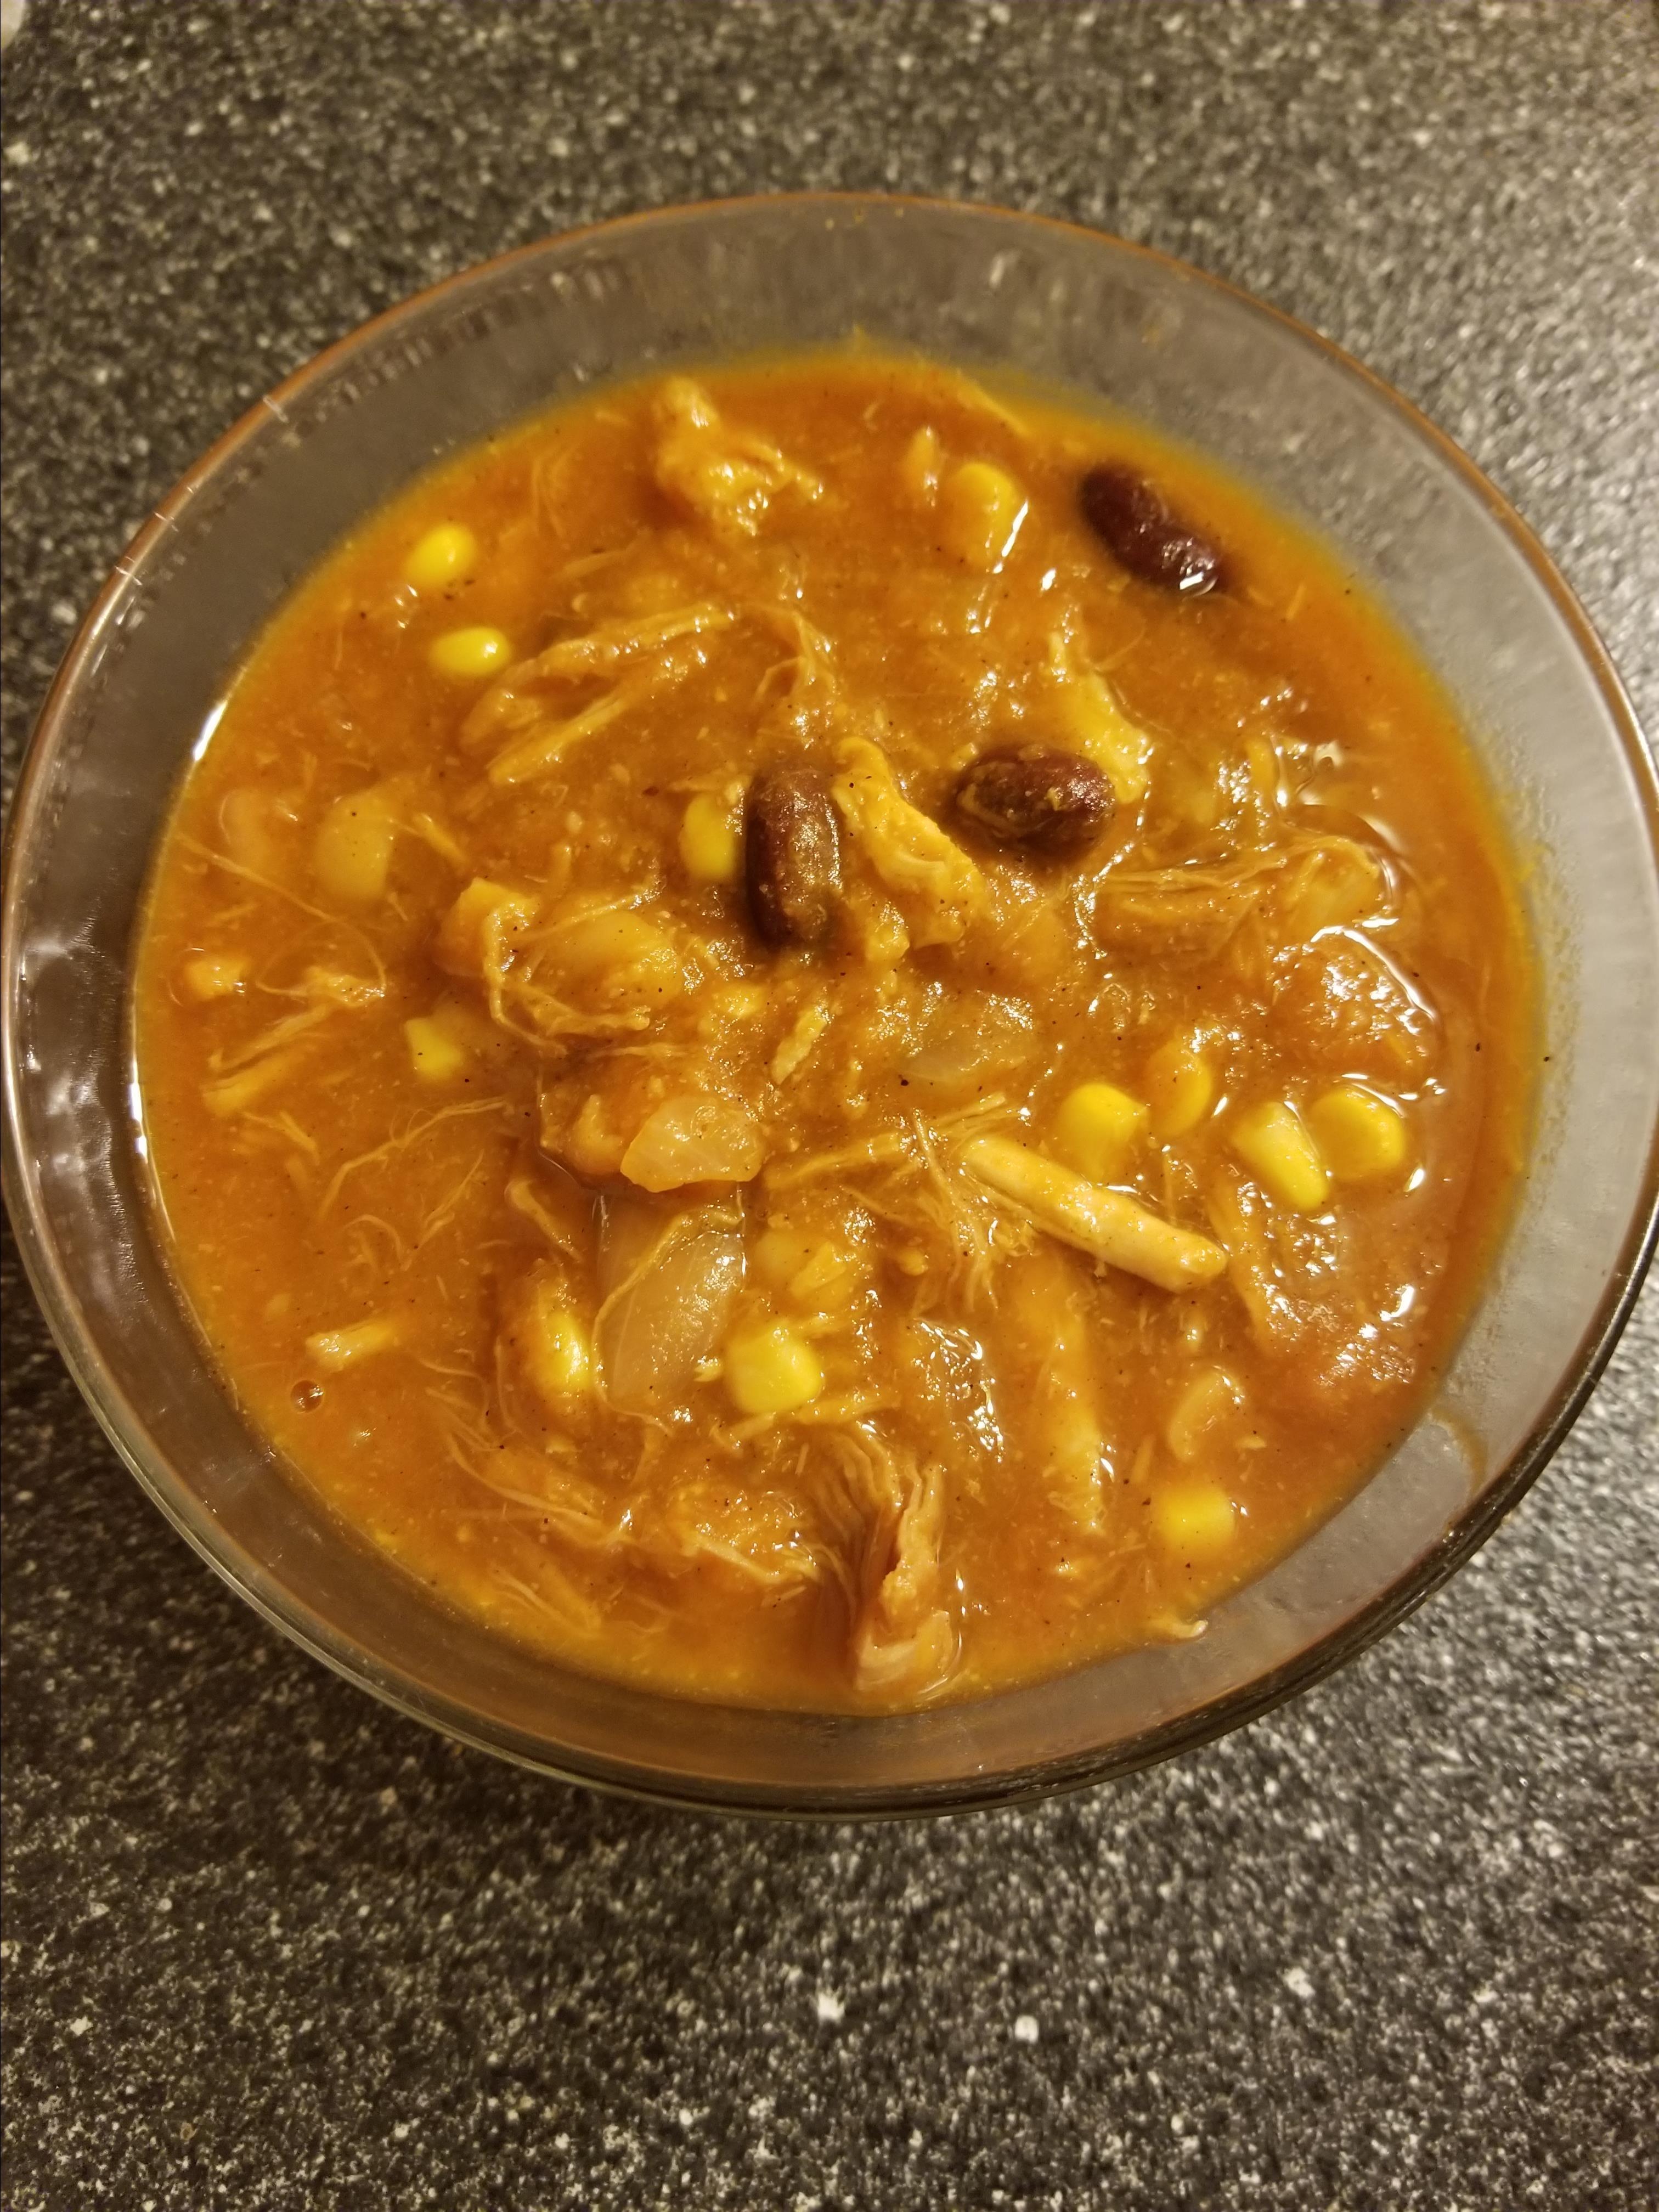 Pumpkin-Pulled Pork Chili